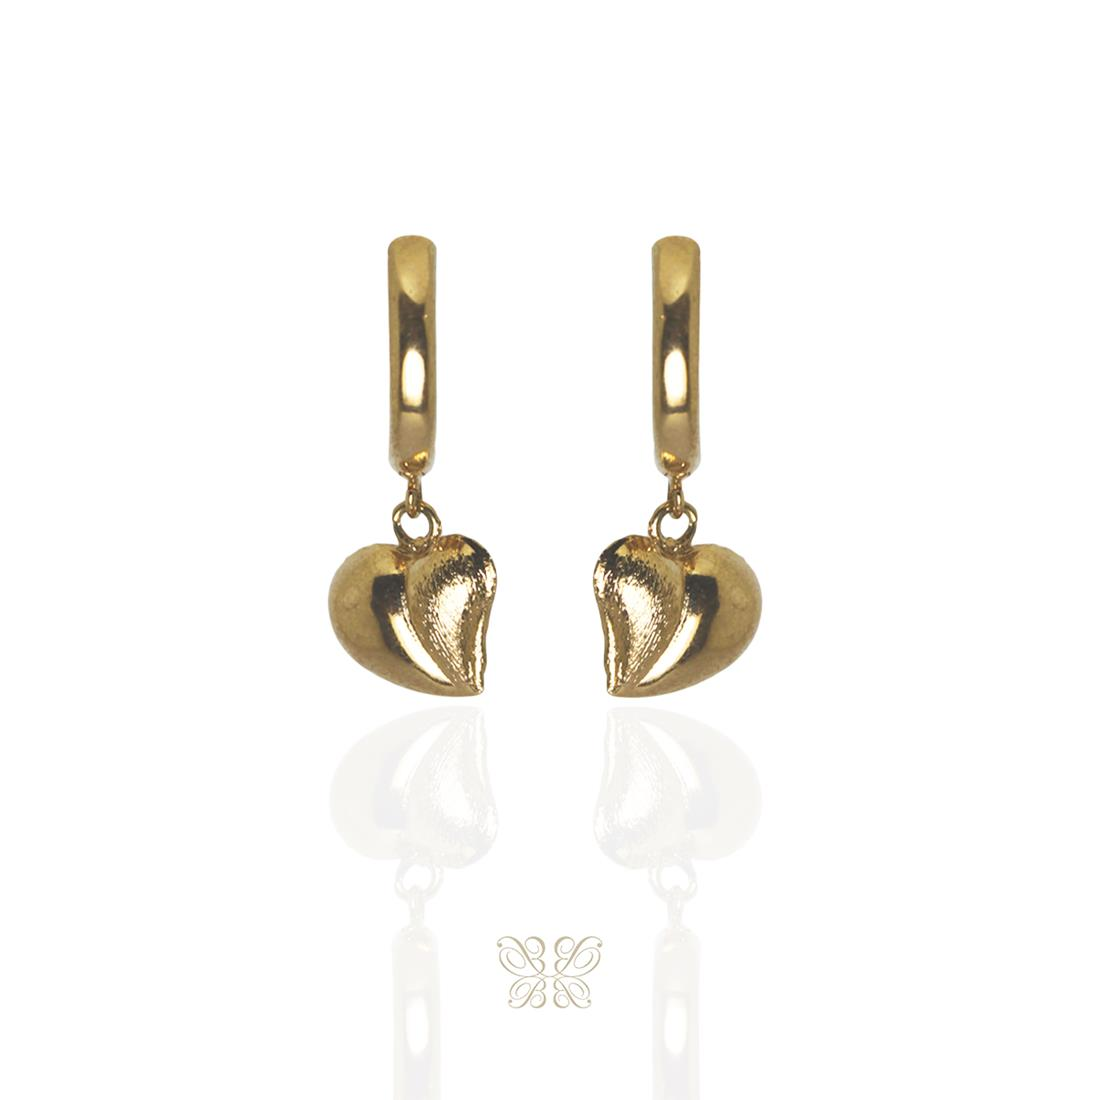 Brinco Argola Dourado Metal Banhado a Ouro Barbara Strauss